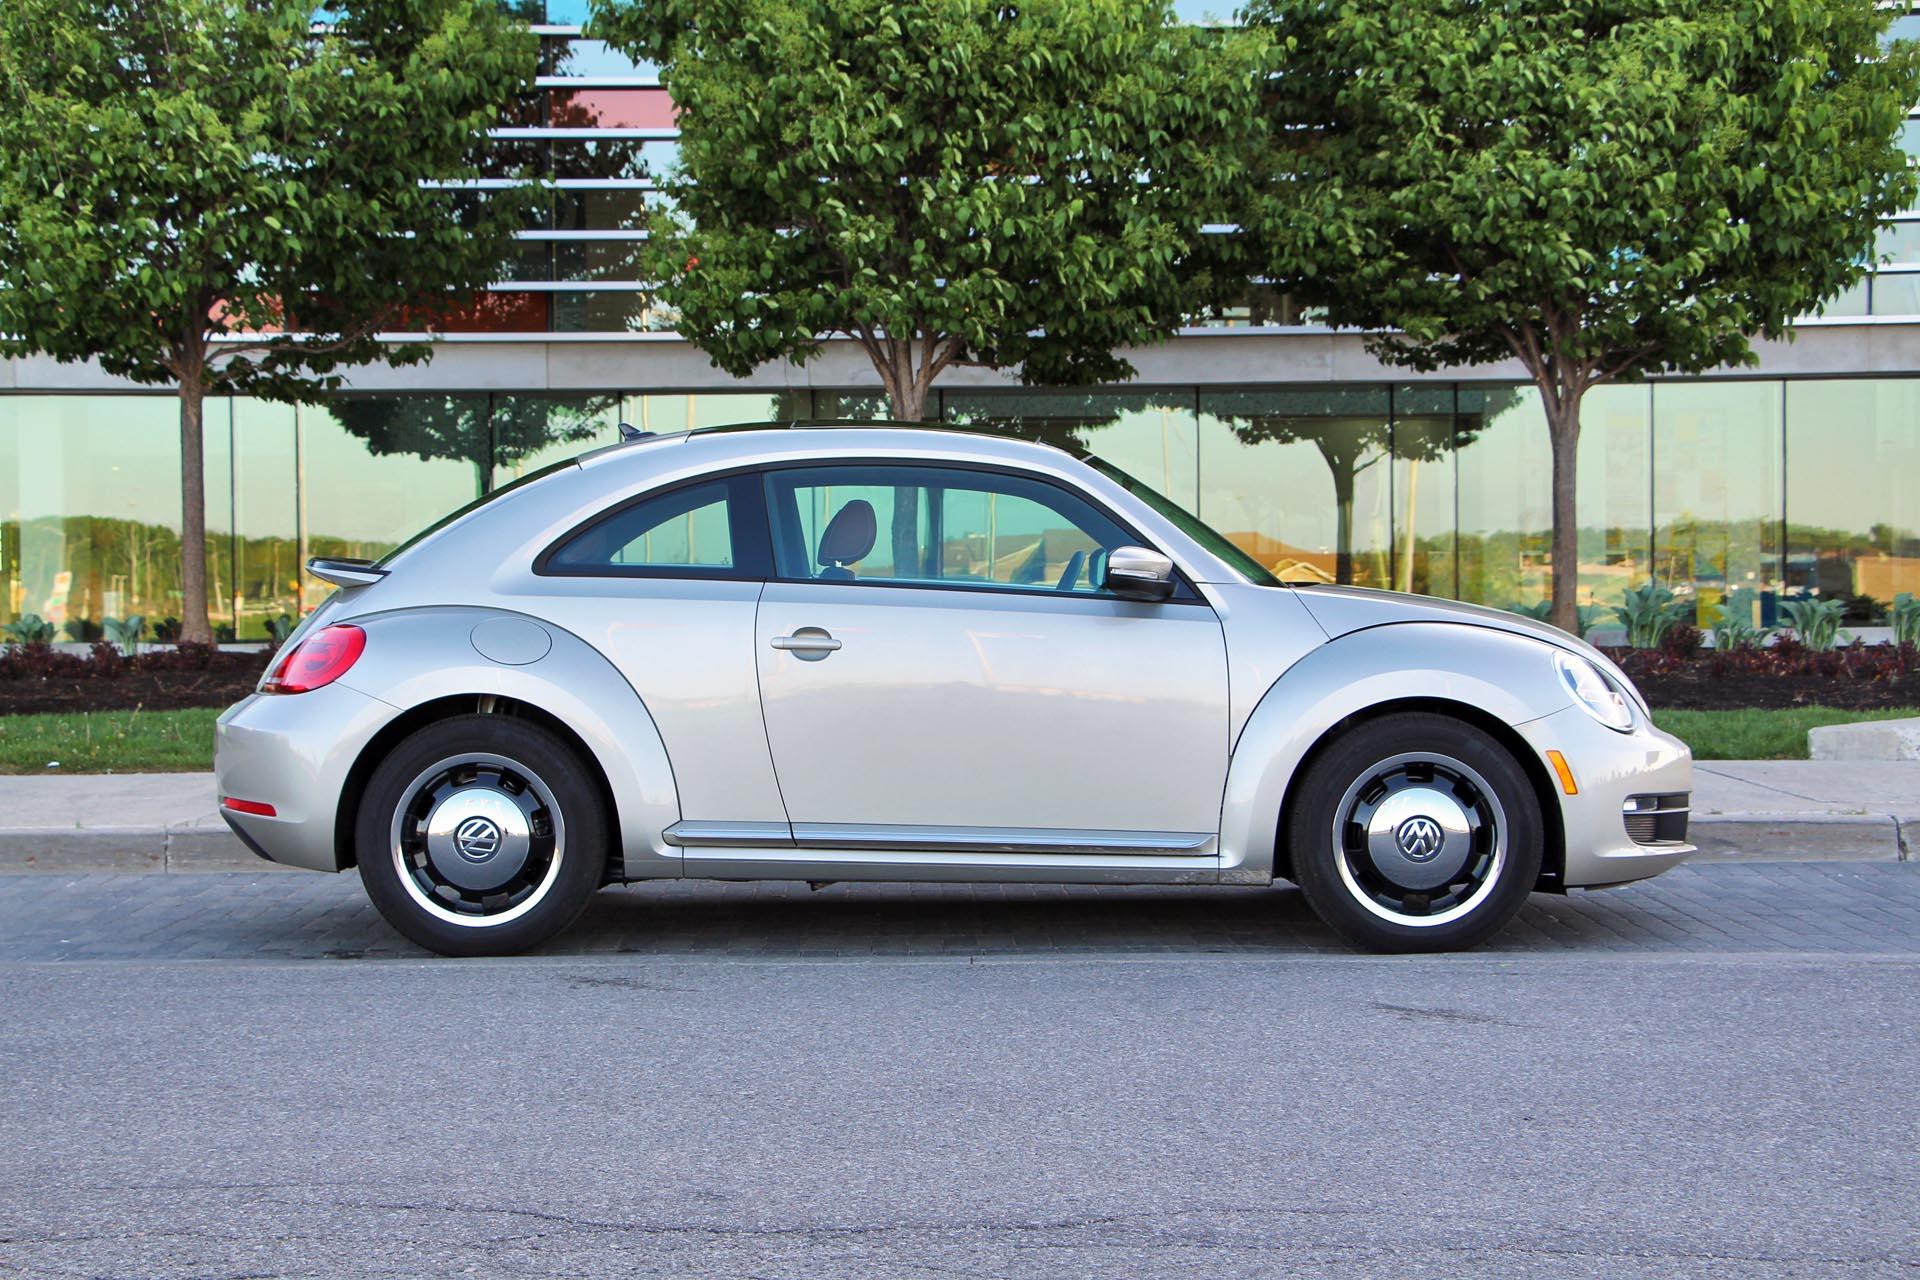 2015 volkswagen beetle classic. Black Bedroom Furniture Sets. Home Design Ideas